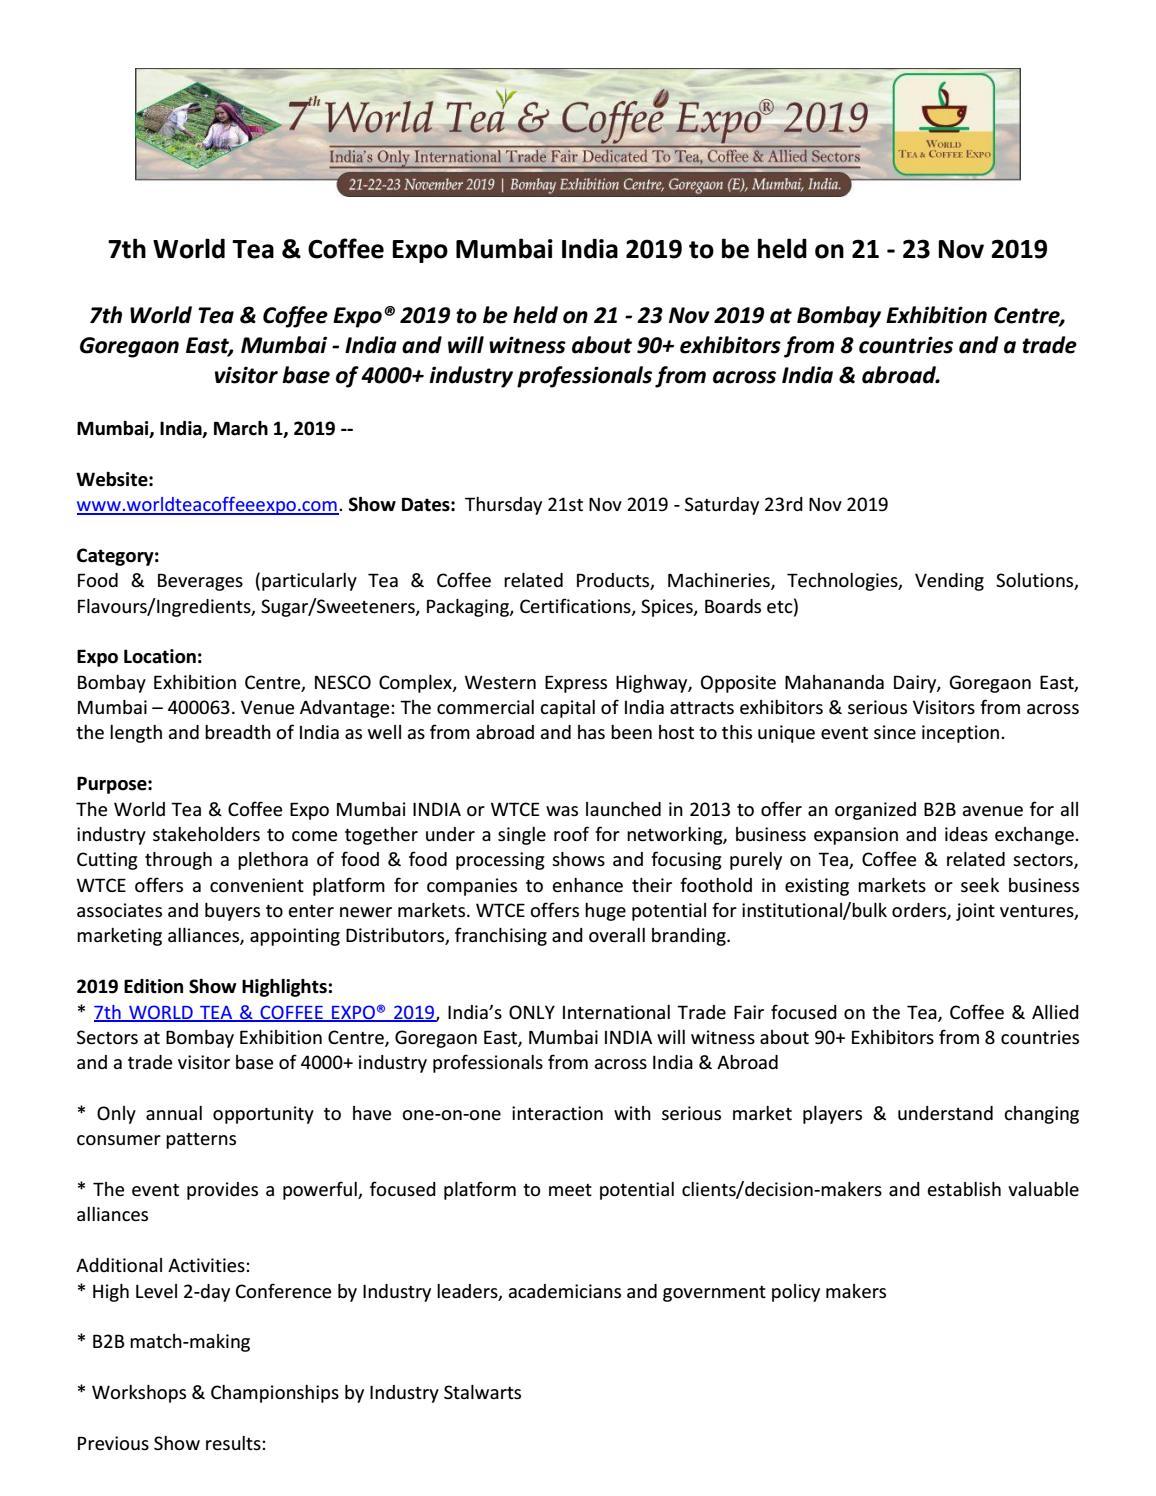 7th World Tea & Coffee Expo Mumbai India 2019 to be held on